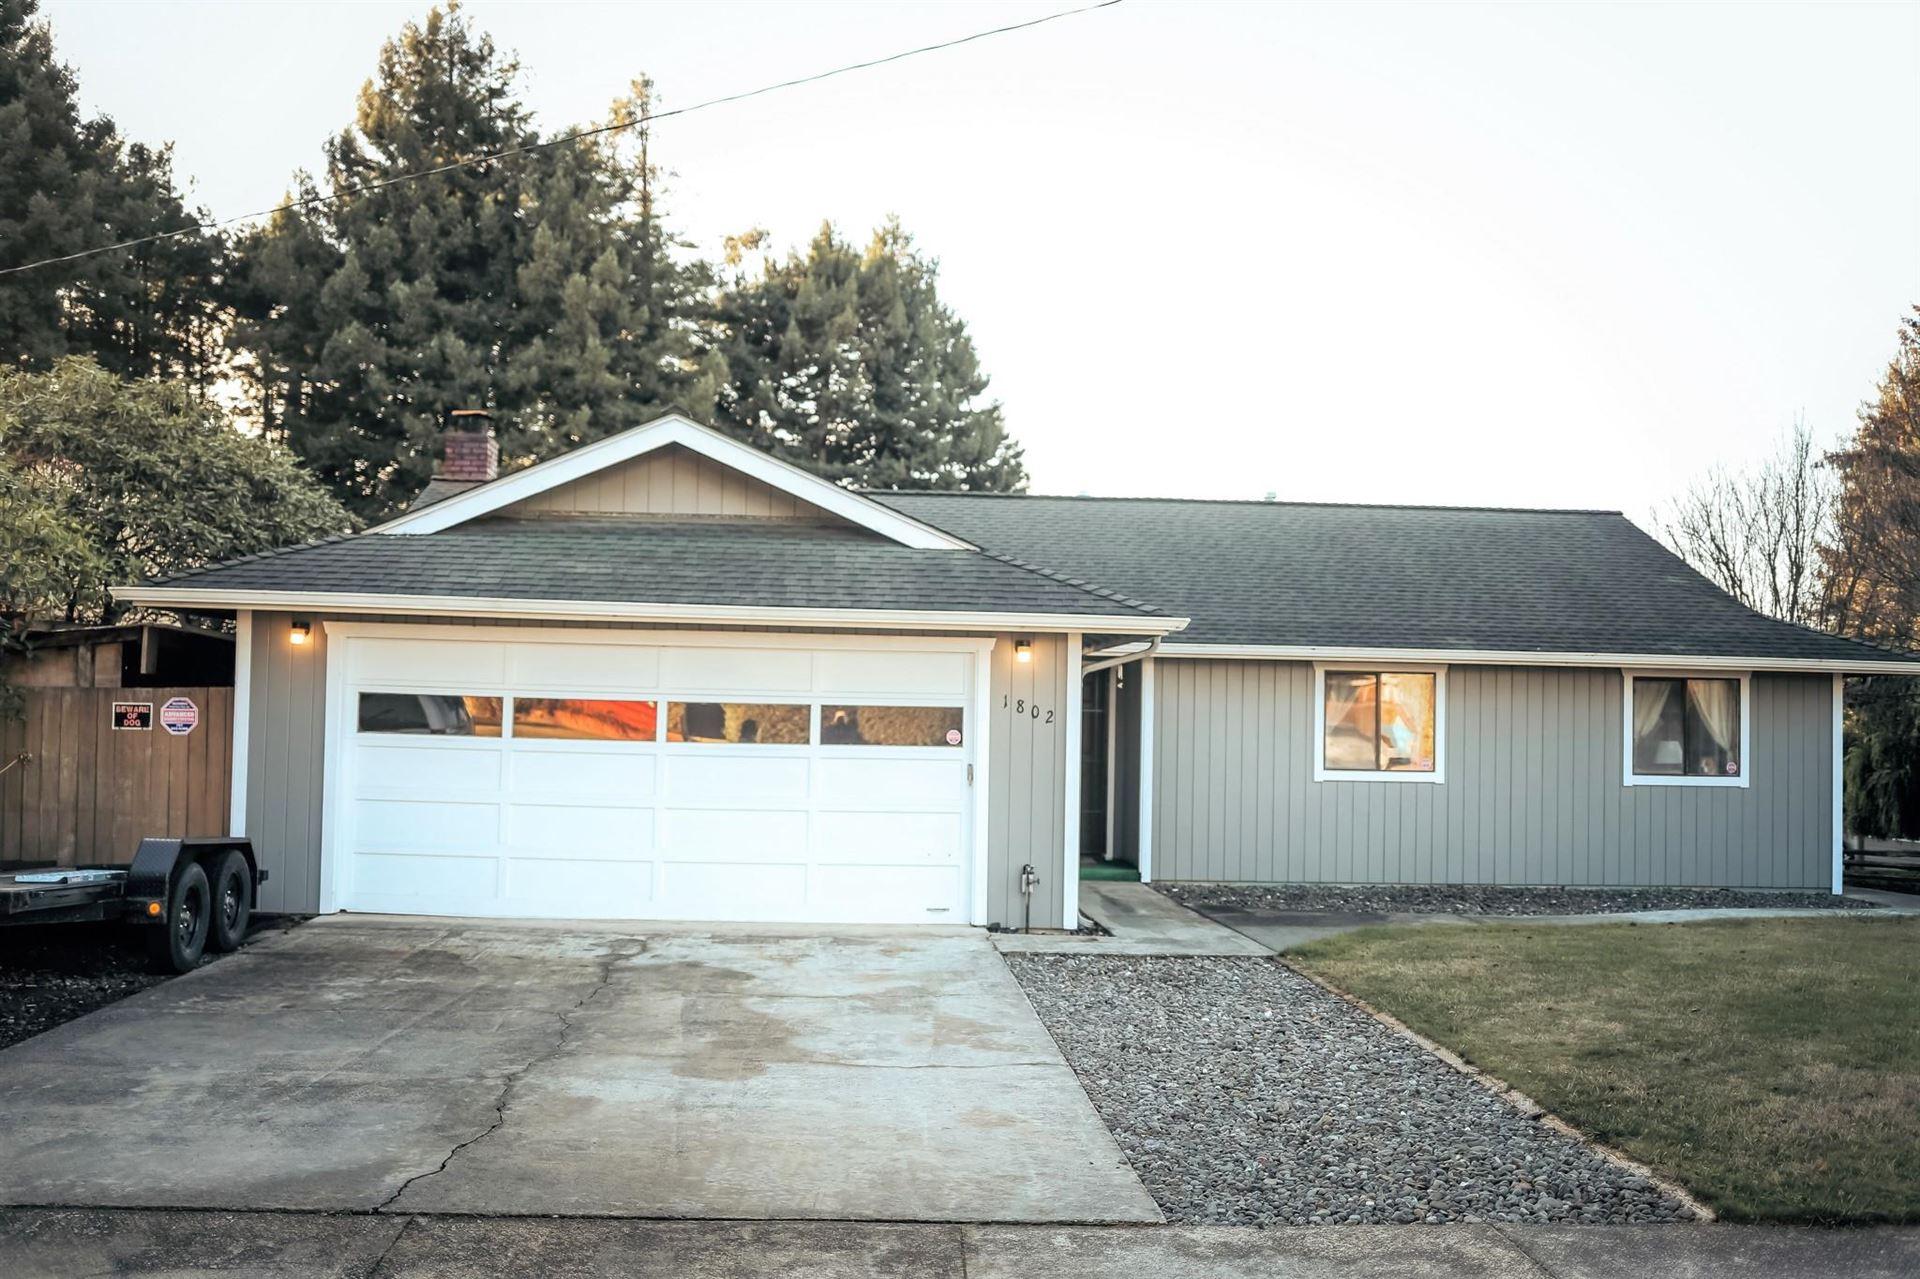 1802 Mcfarlan Street, Eureka, CA 95501 - MLS#: 257931